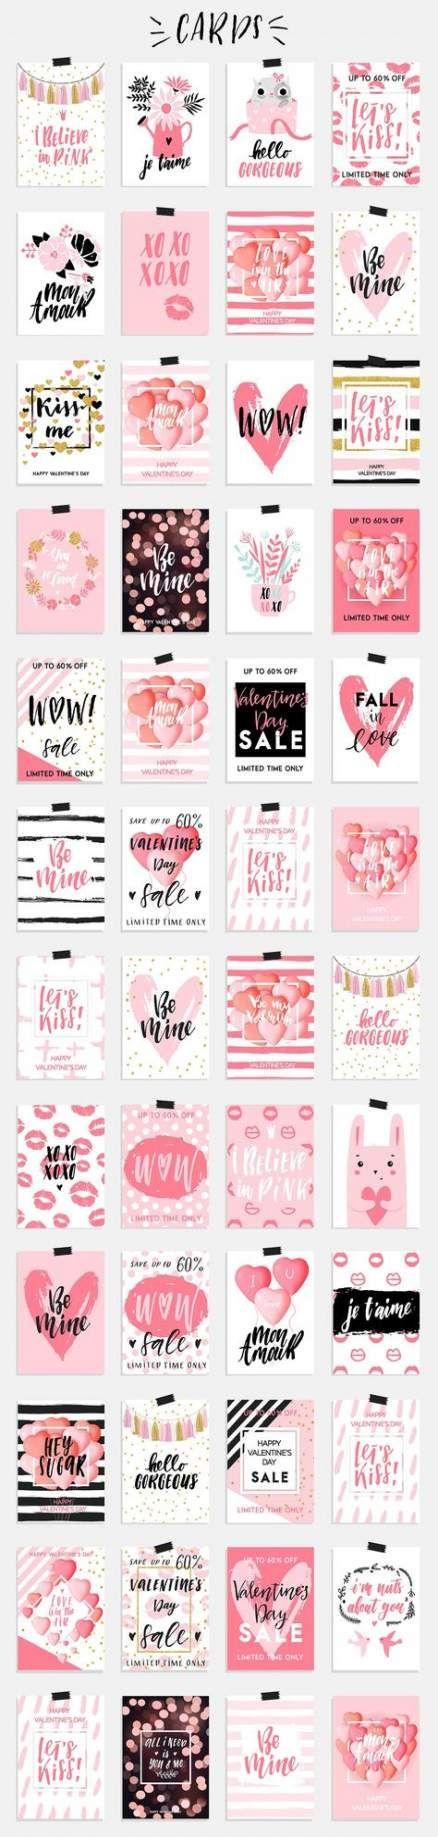 New gifts for boyfriend unique valentines Ideas